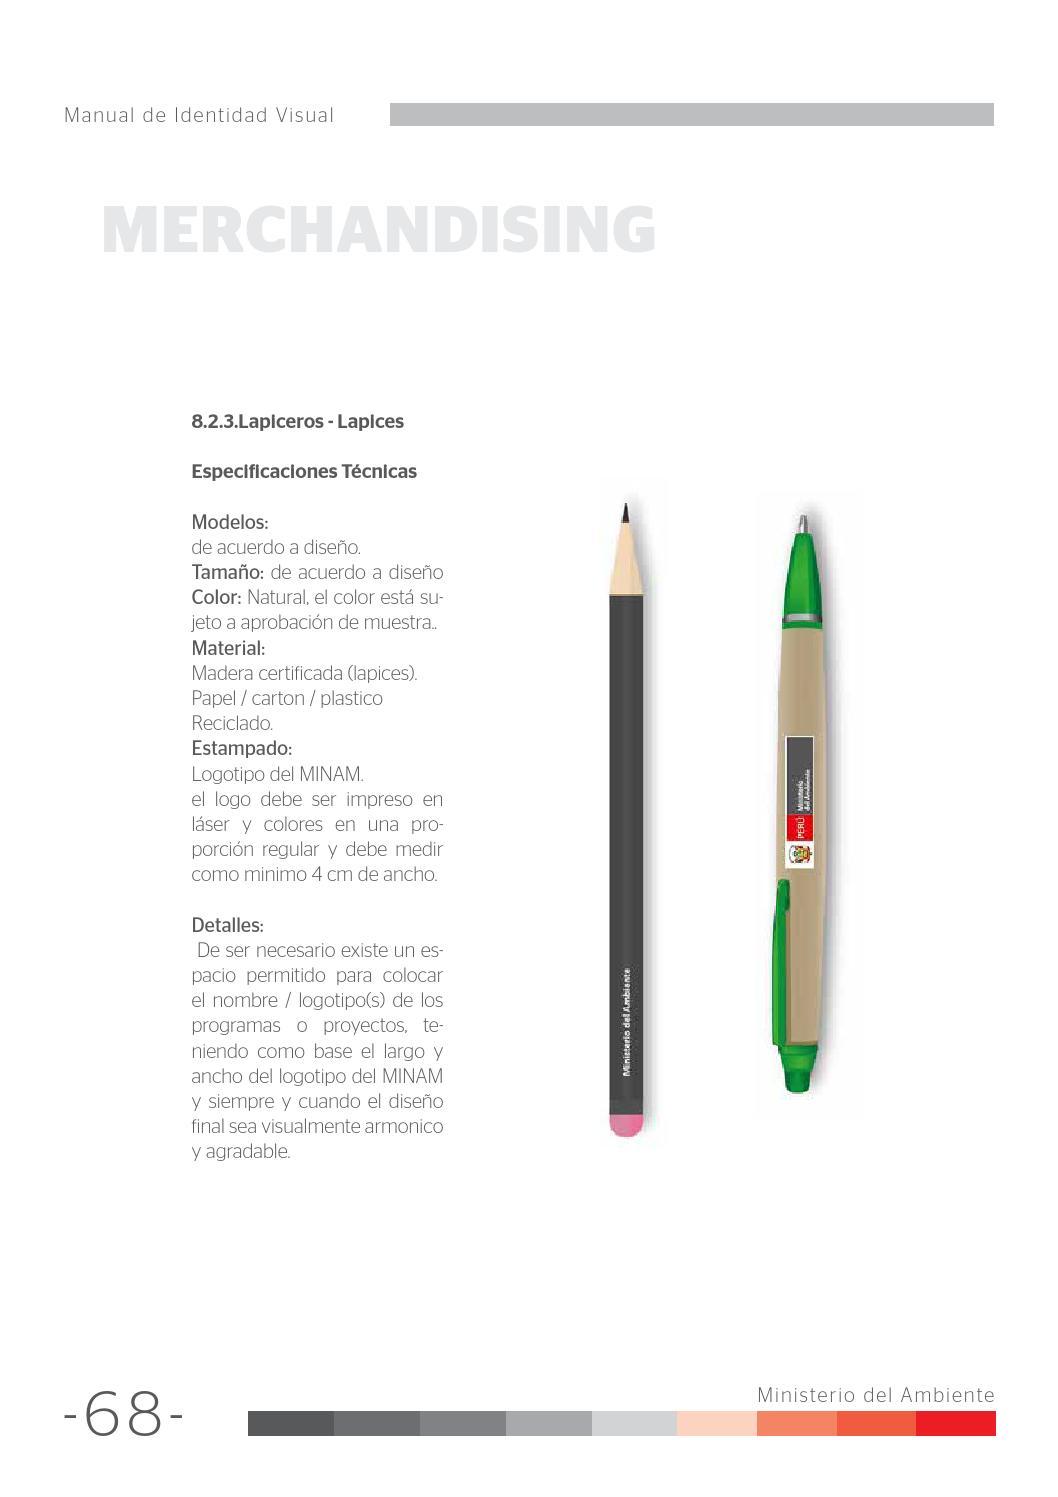 Manual de identidad visual MINAM by Ministerio del